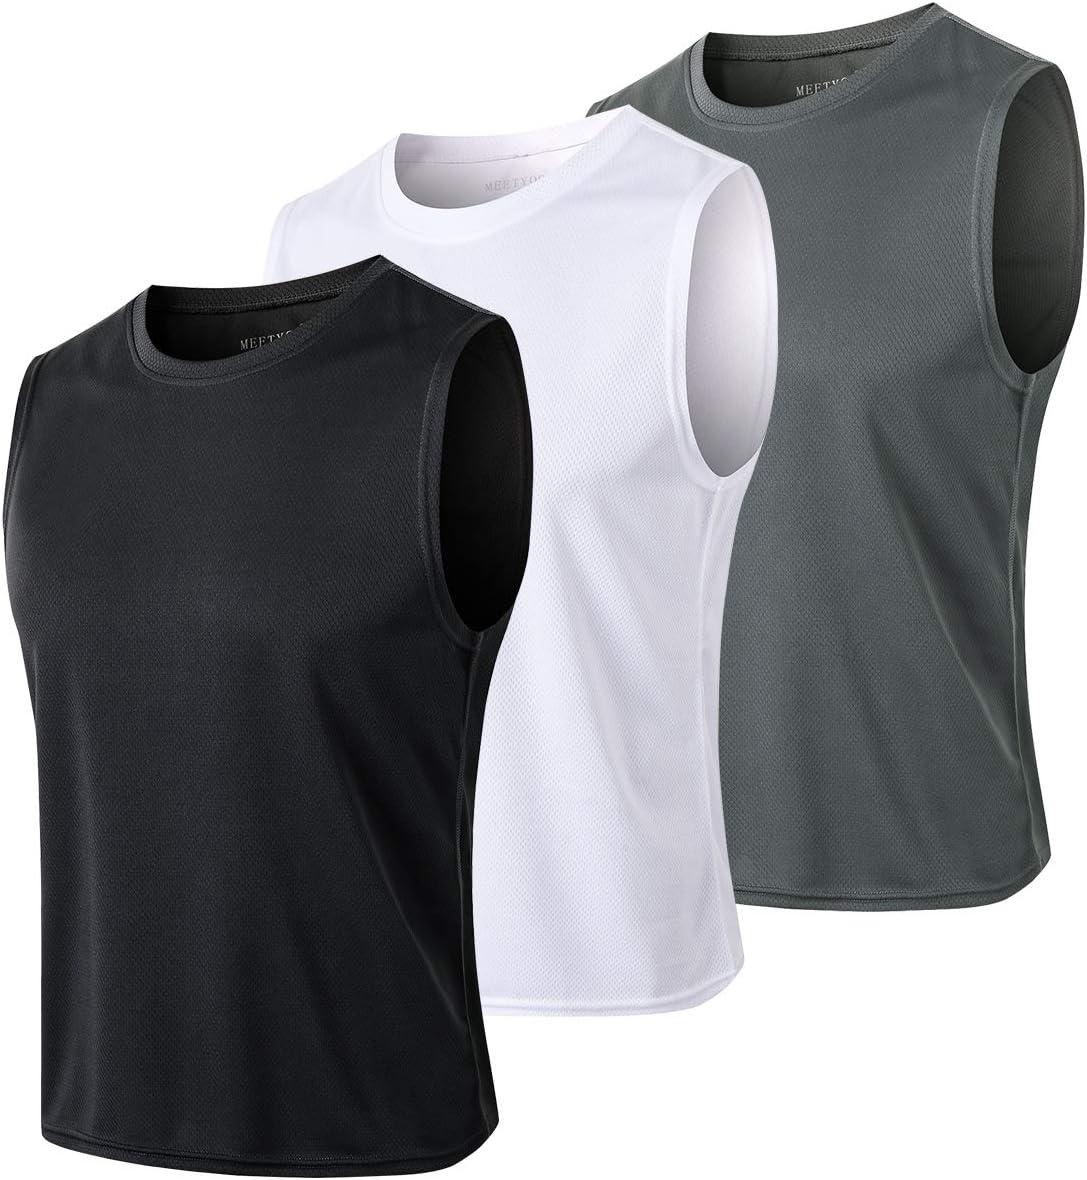 T-Shirt sans Manches Maillot Running Tee Shirt pour Sports Jogging Musculation MEETYOO Debardeur Homme